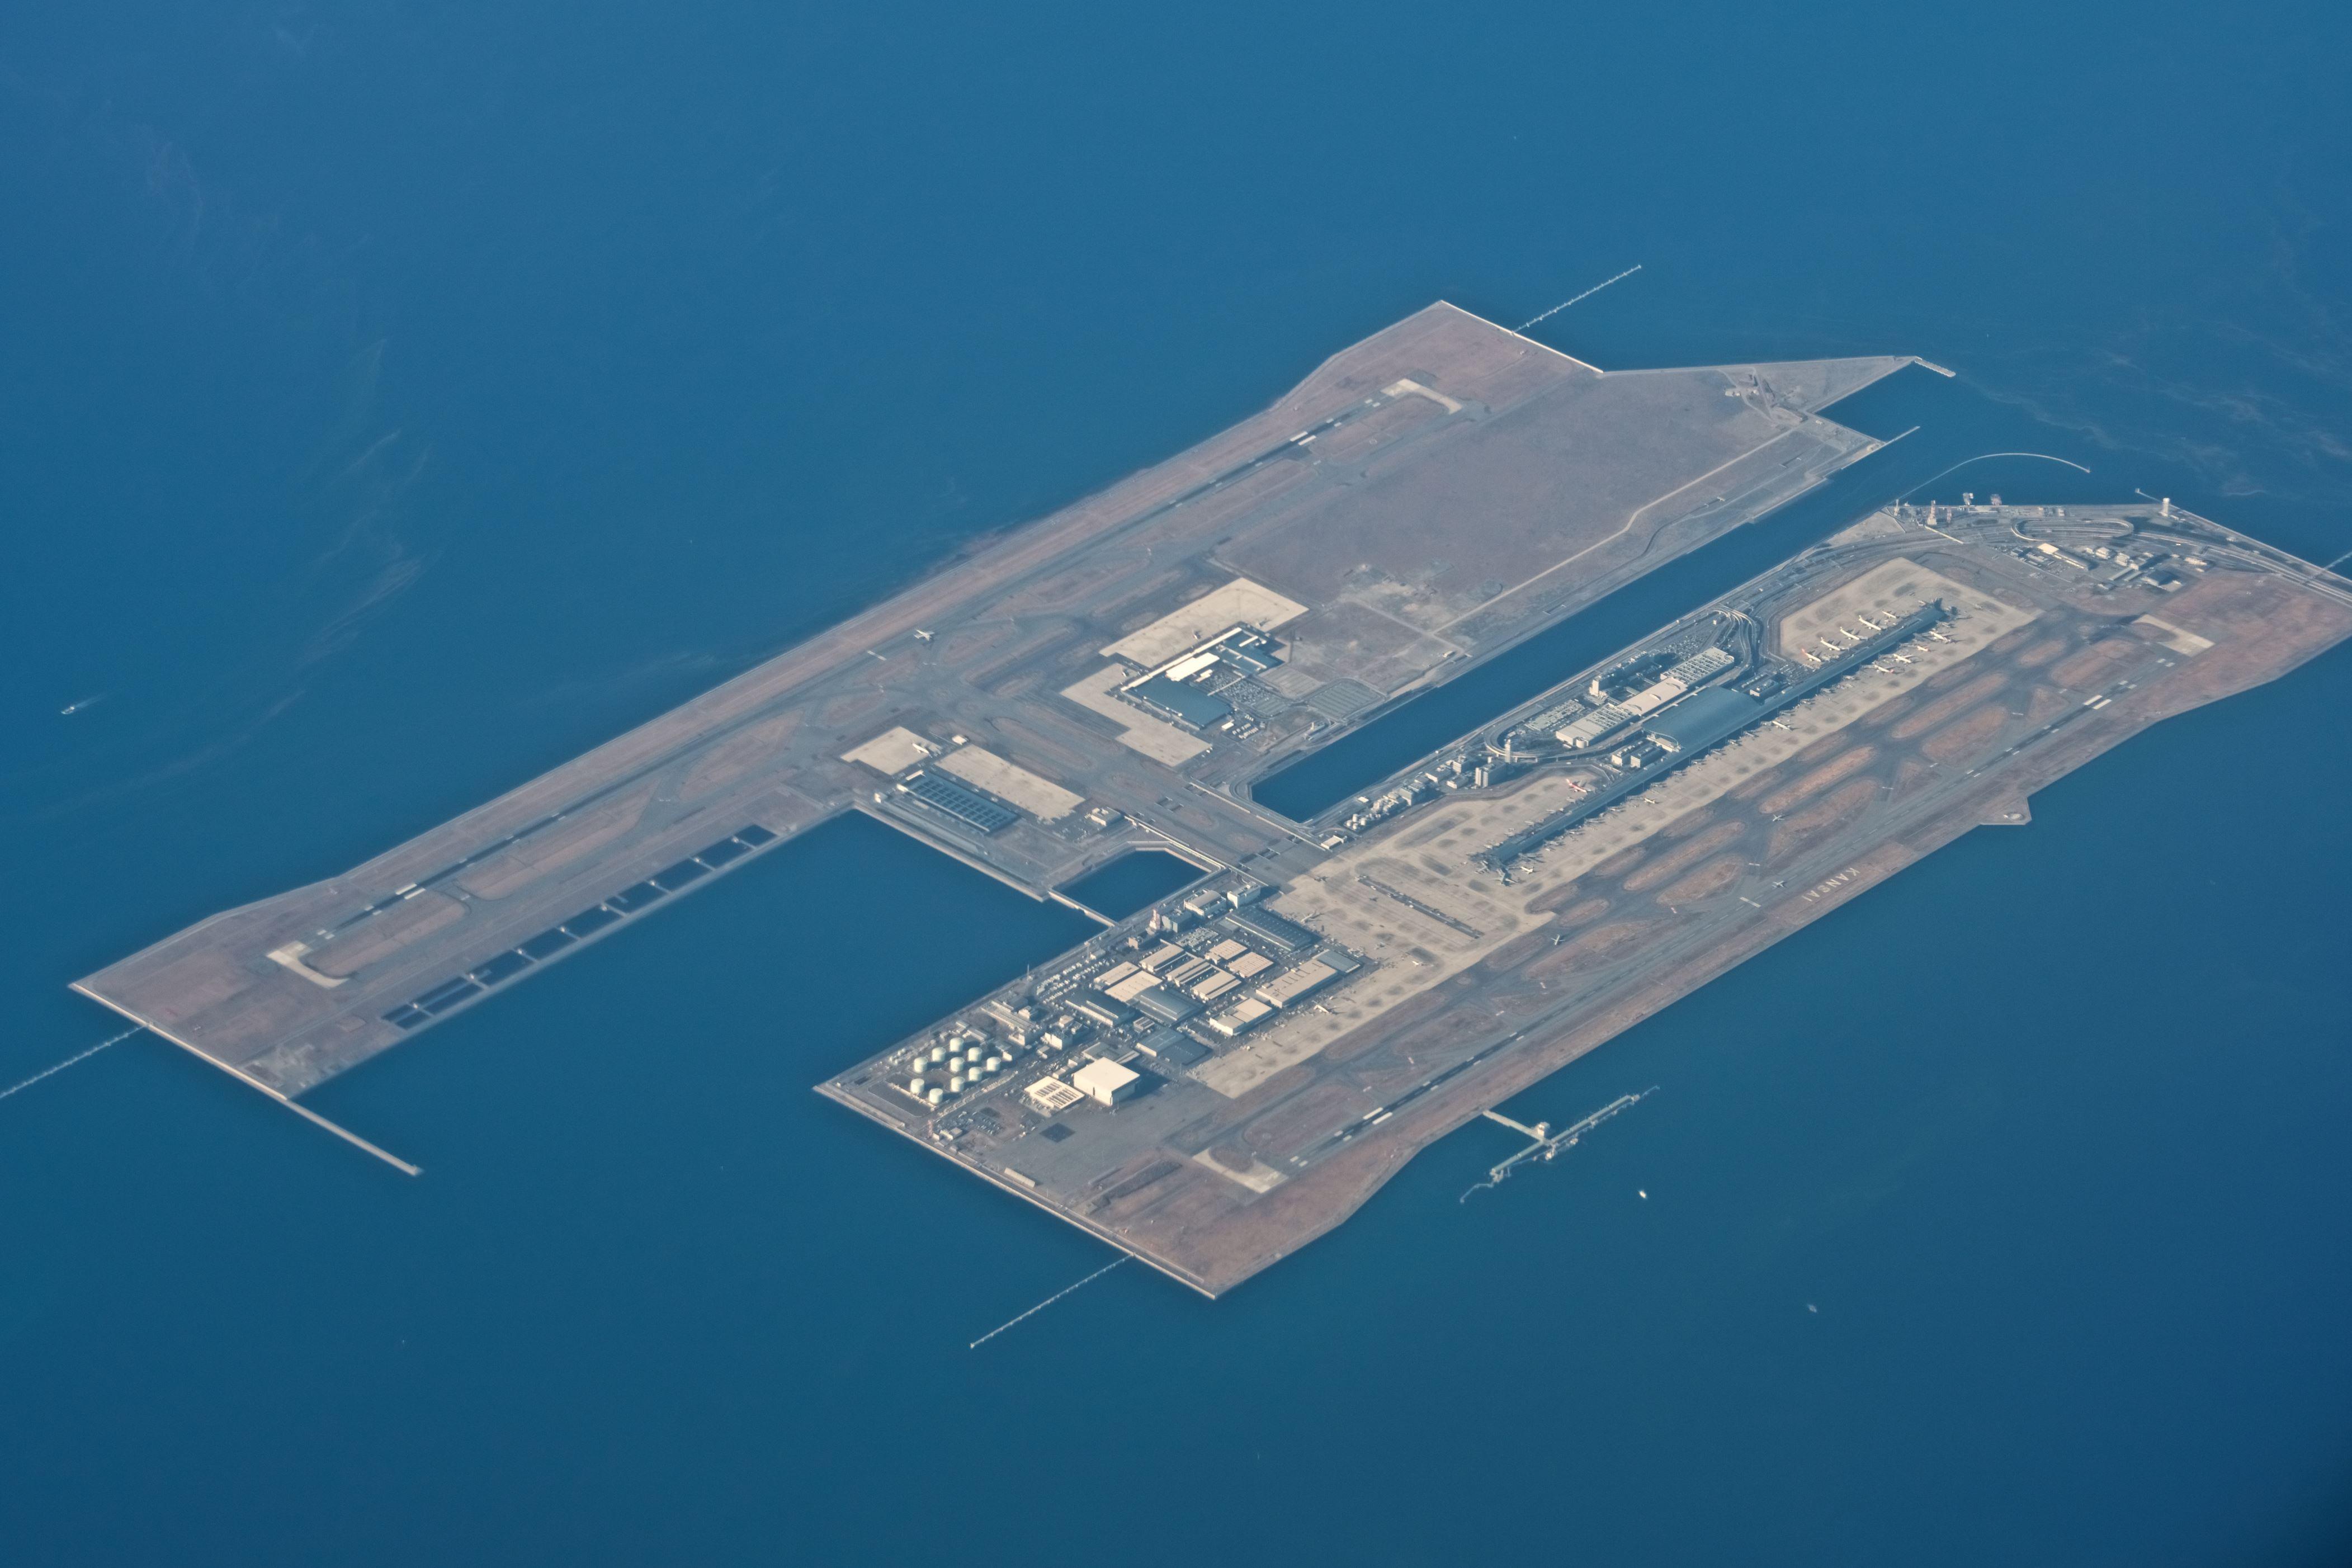 Slide 16 of 20: Kansai International Airport, daytime aerial view from airplane